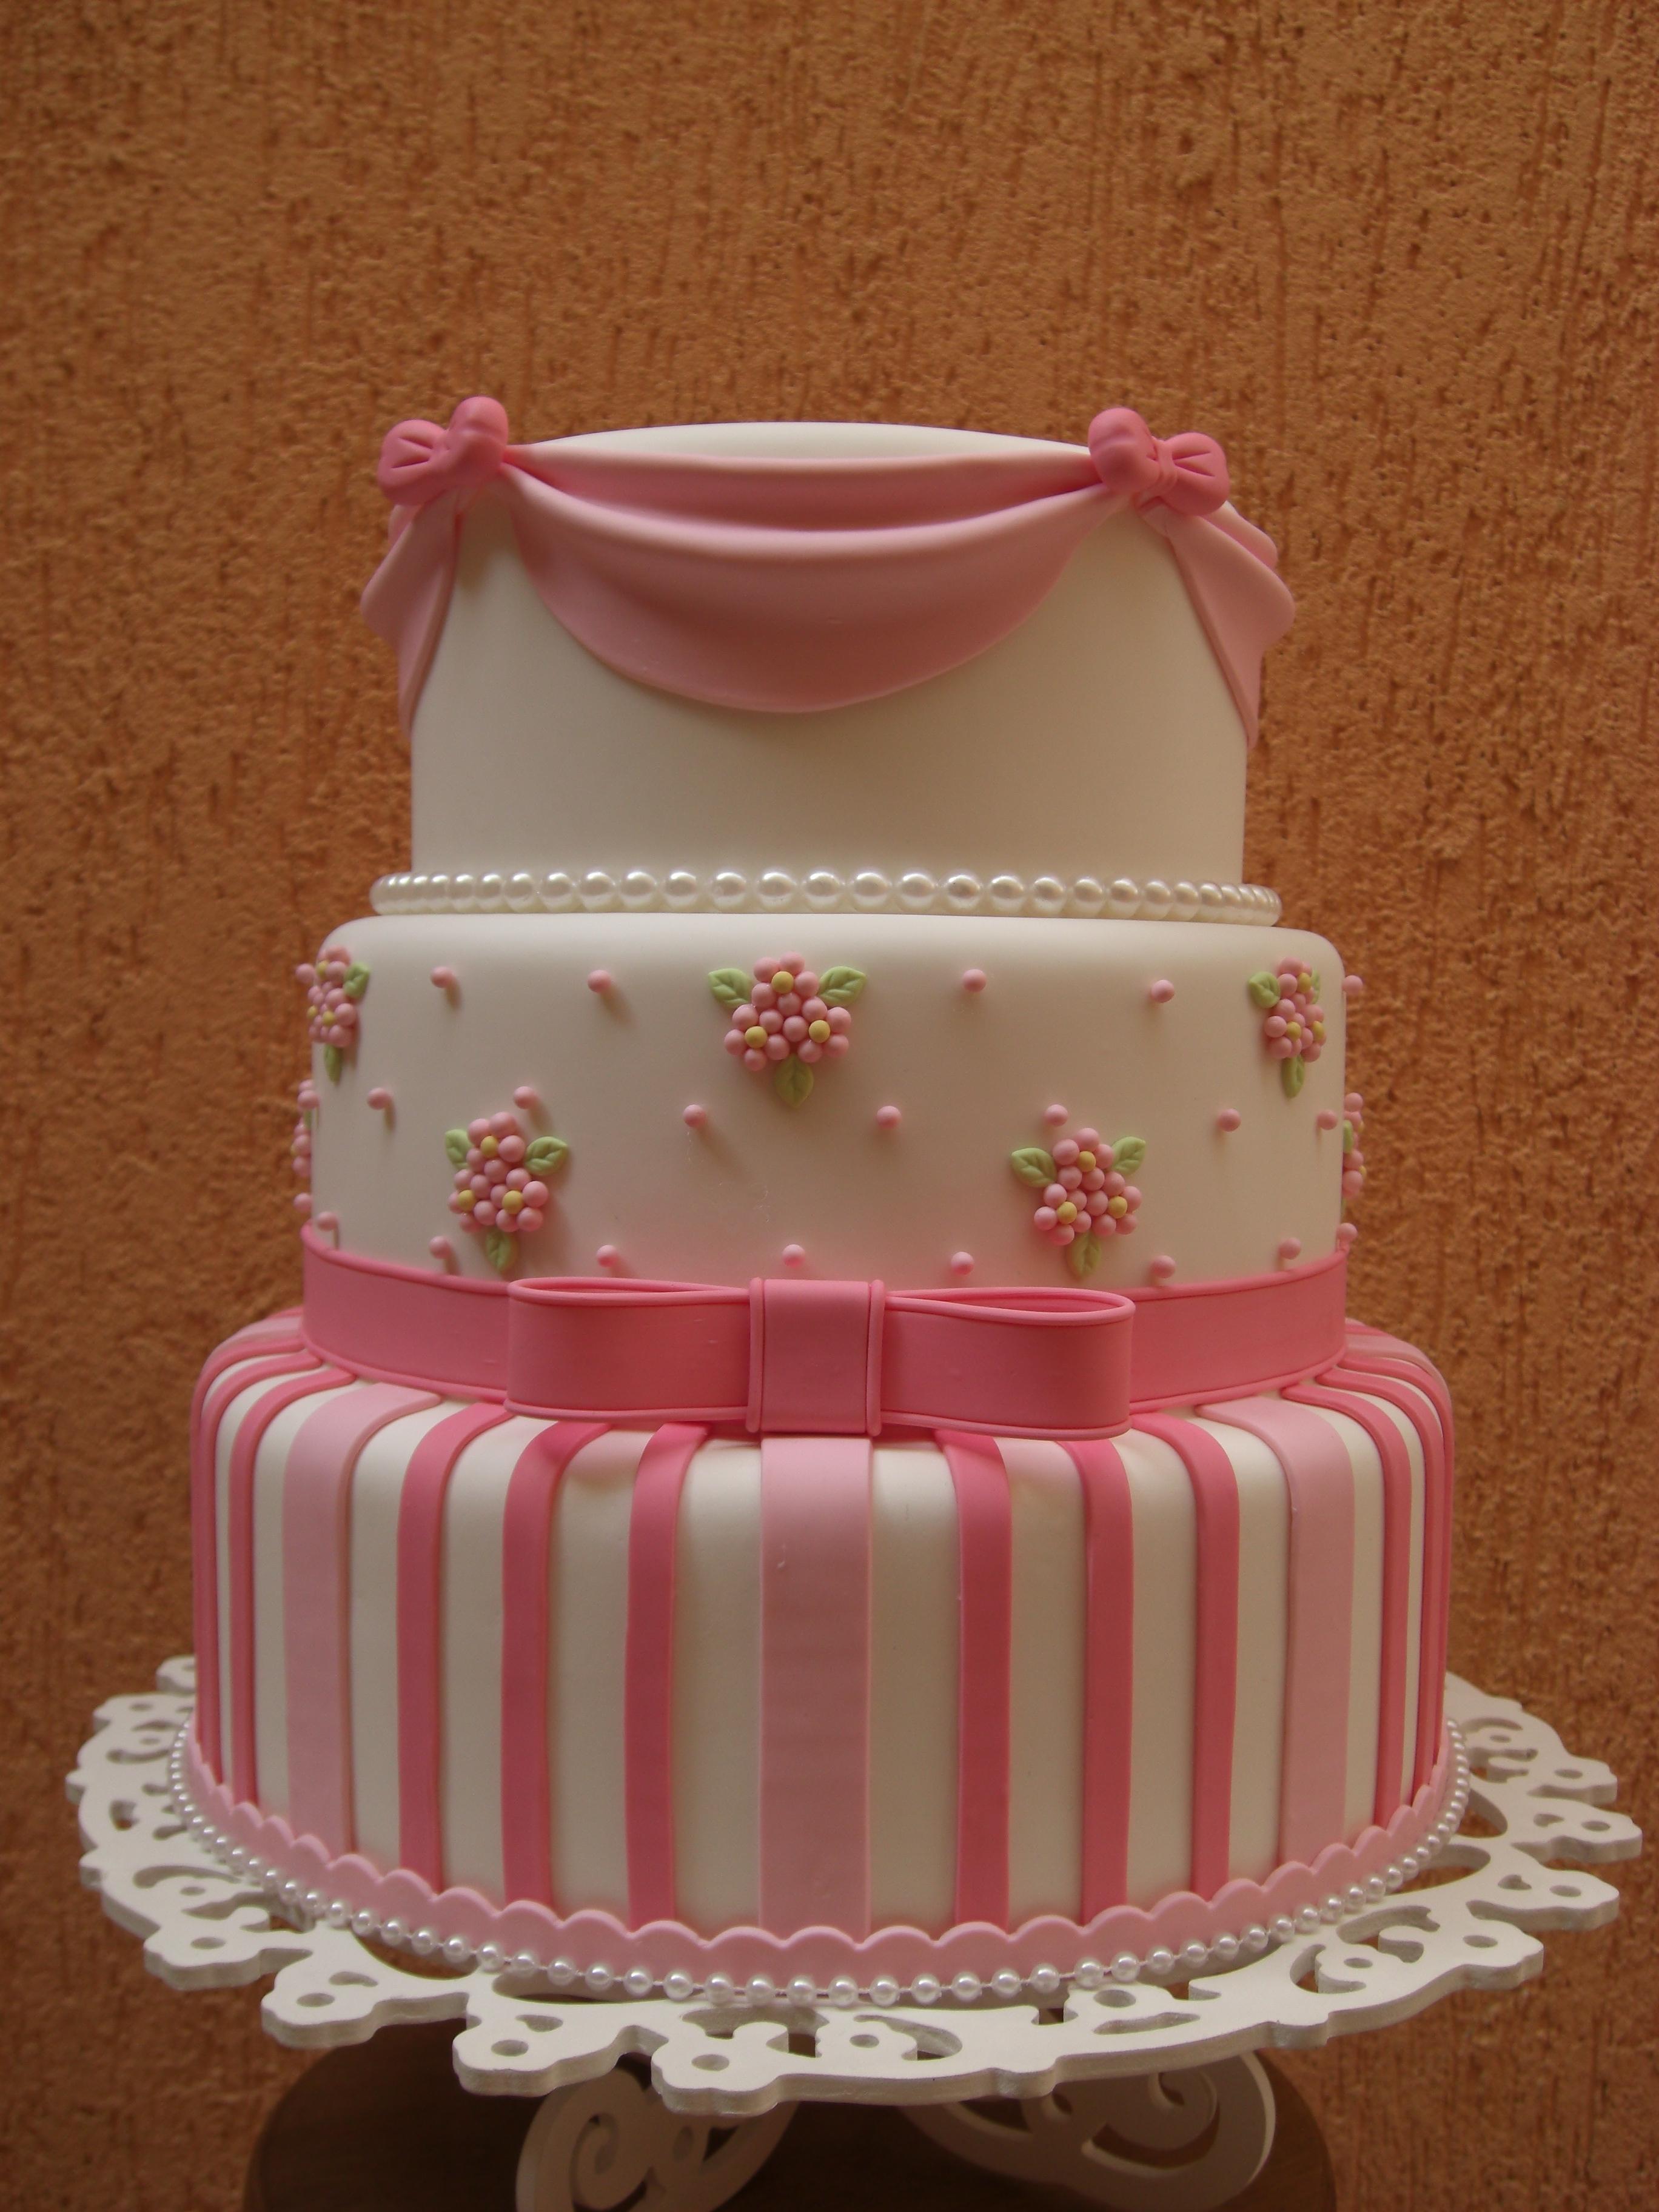 decoracao de bolo jardim encantado:Bolo cenográfico jardim encantado rosa